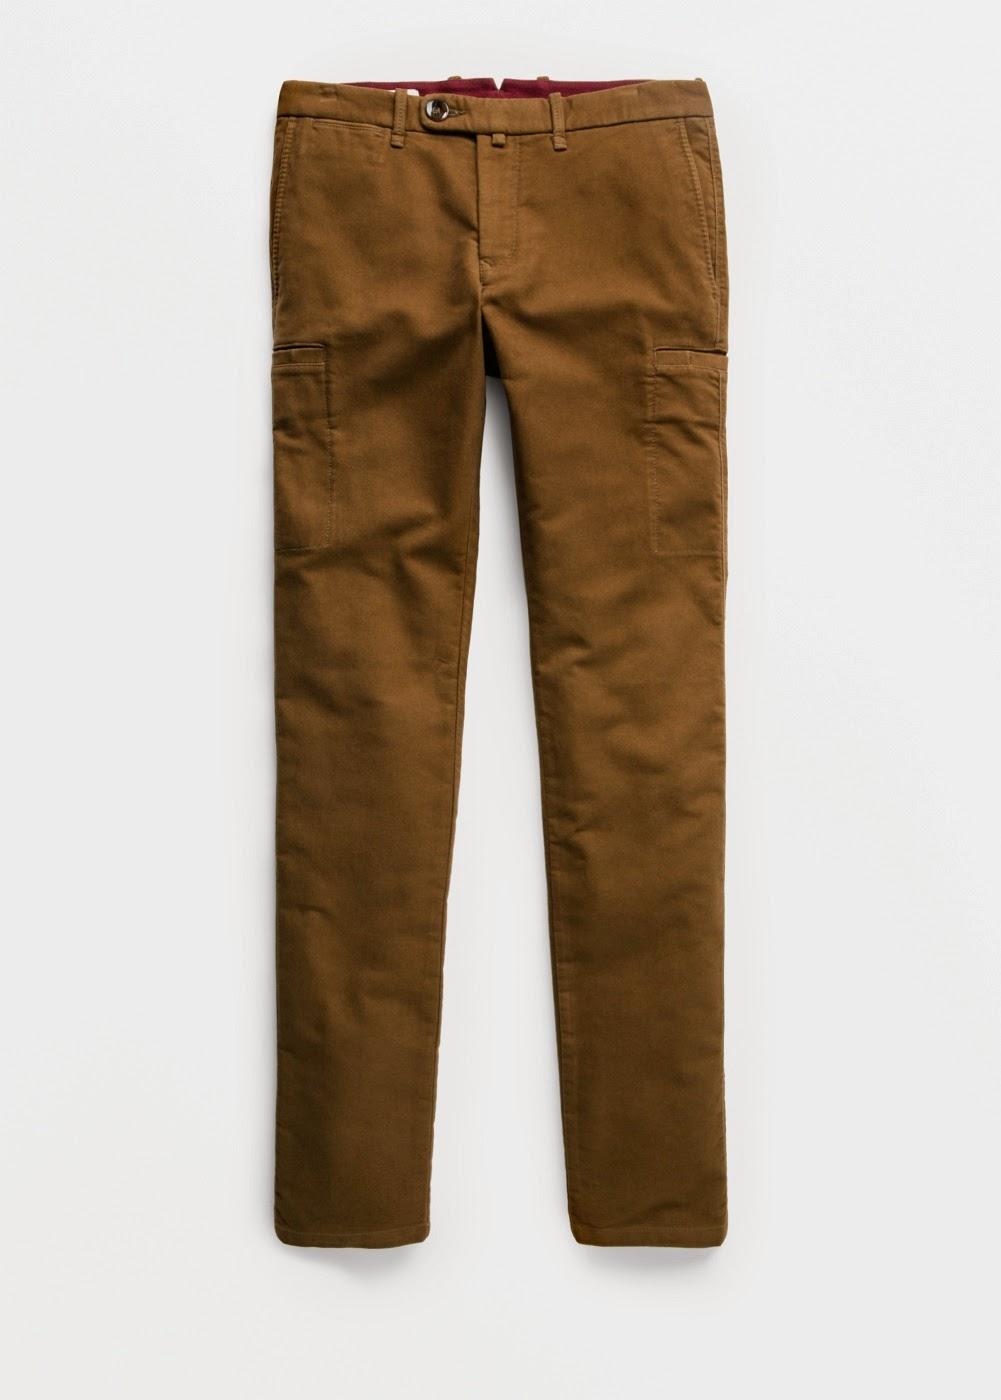 http://shop.mango.com/ES/p0/hombre/prendas/pantalones/pantalon-cargo-algodon/?id=33007007_T3&n=1&s=prendas_he.pantalones_he&ident=0__0_1414744578713&ts=1414744578713